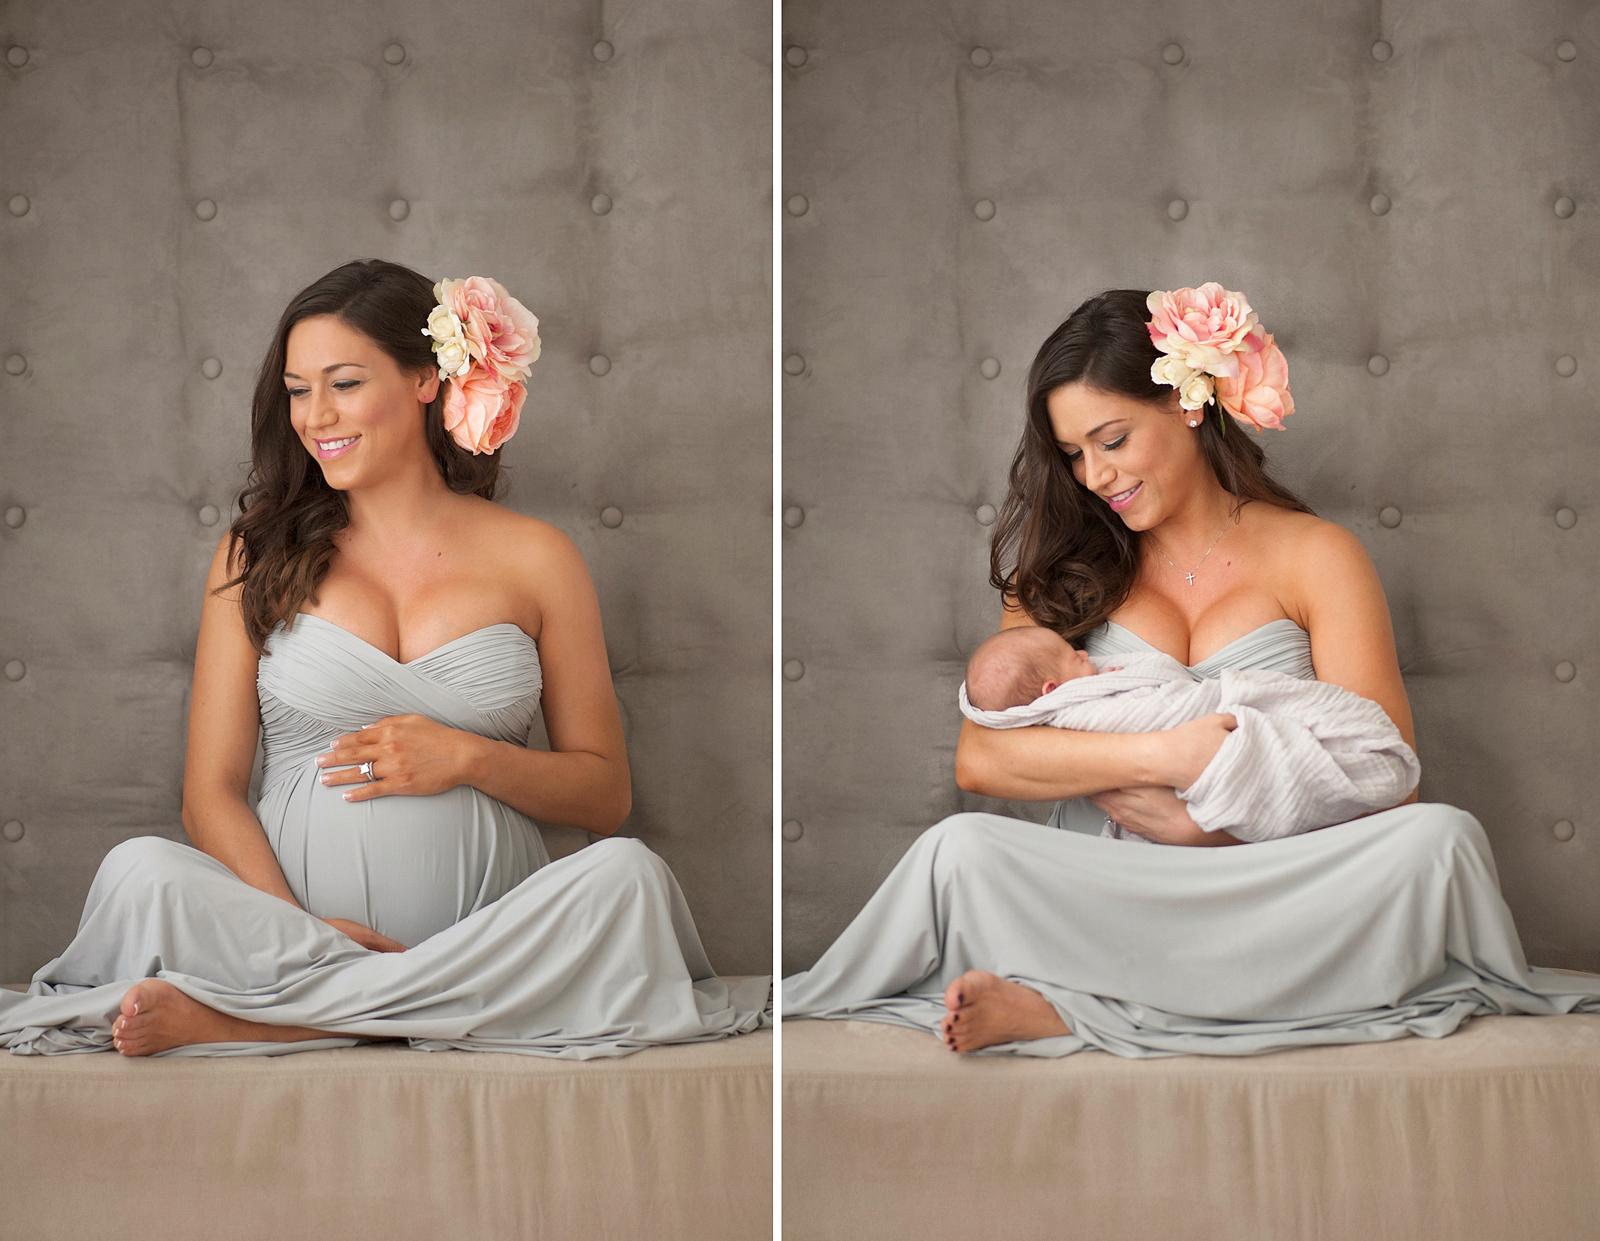 05-maternity-portrait-before-birth-holding-baby-love.jpg